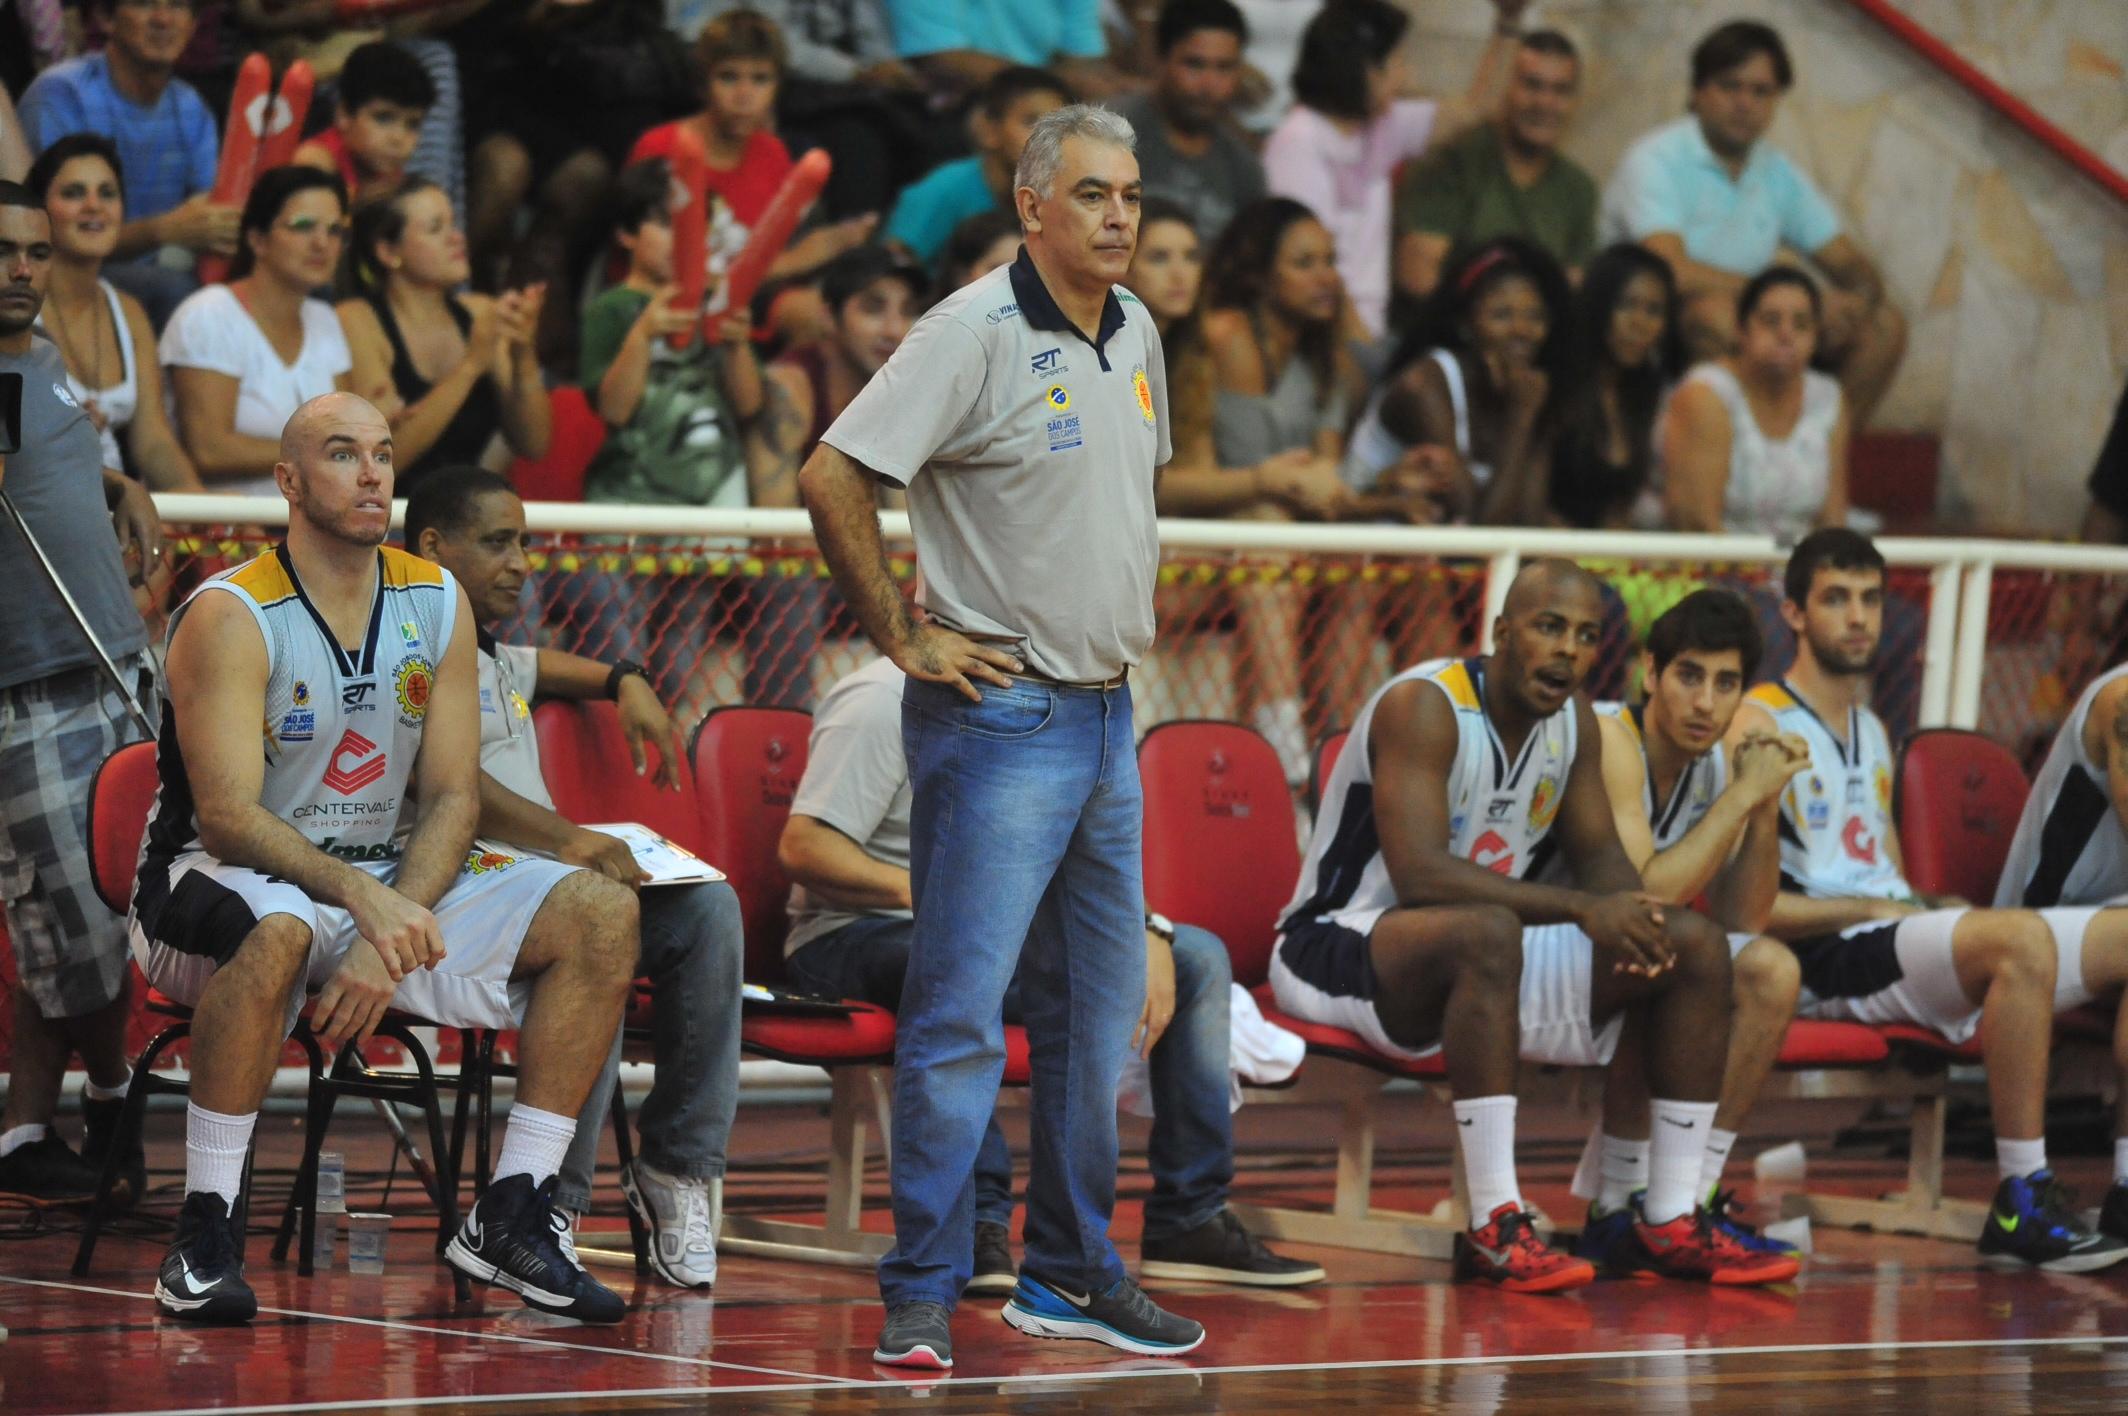 Técnico Luiz Augusto Zanon, do São José